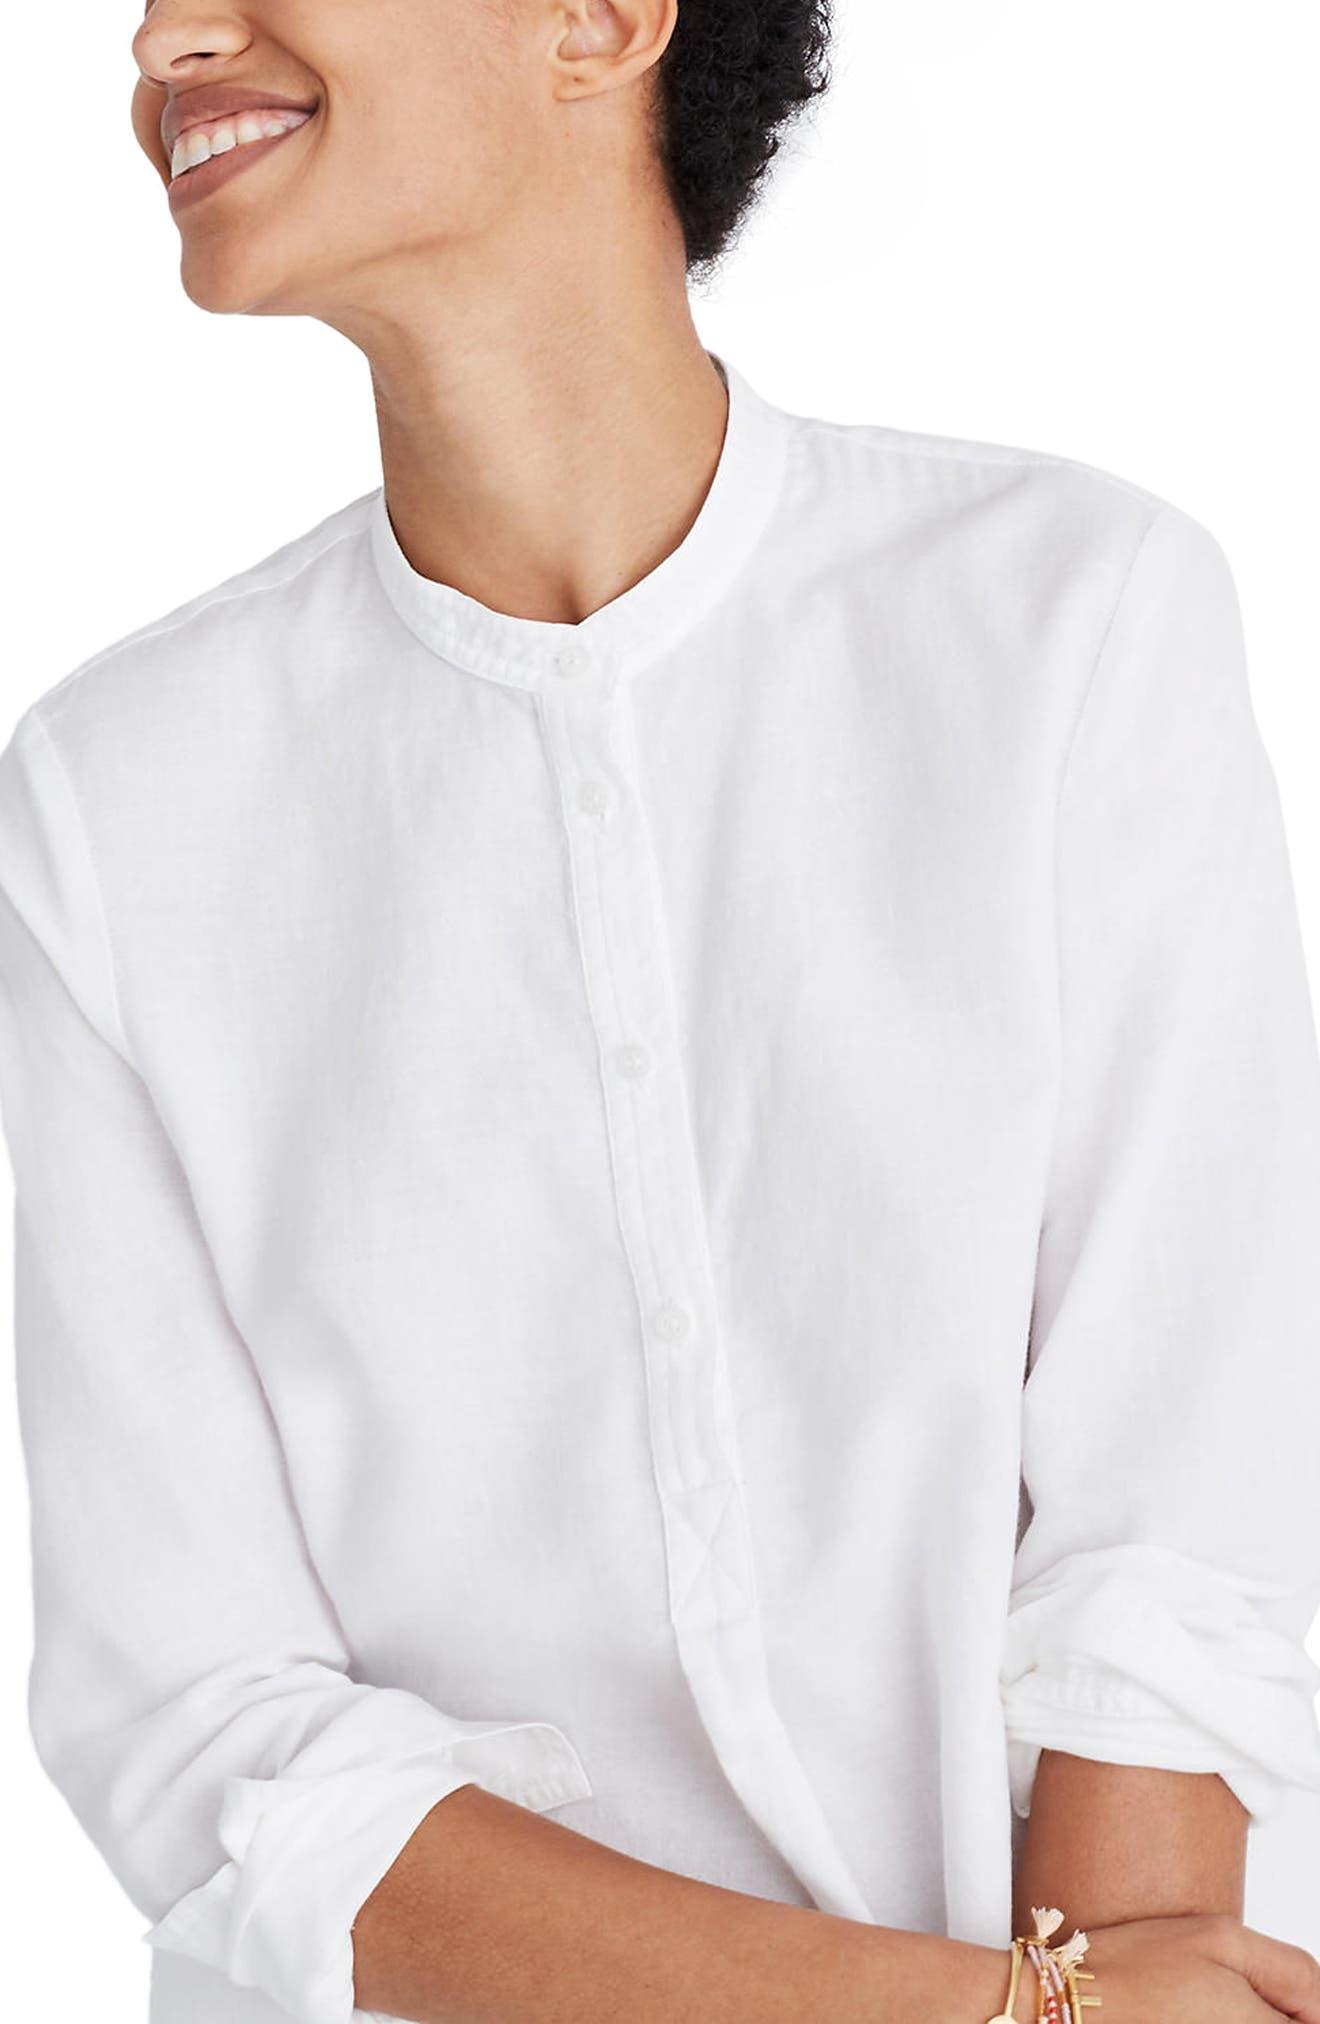 Wellspring Tunic Popover Shirt,                             Main thumbnail 1, color,                             Eyelet White